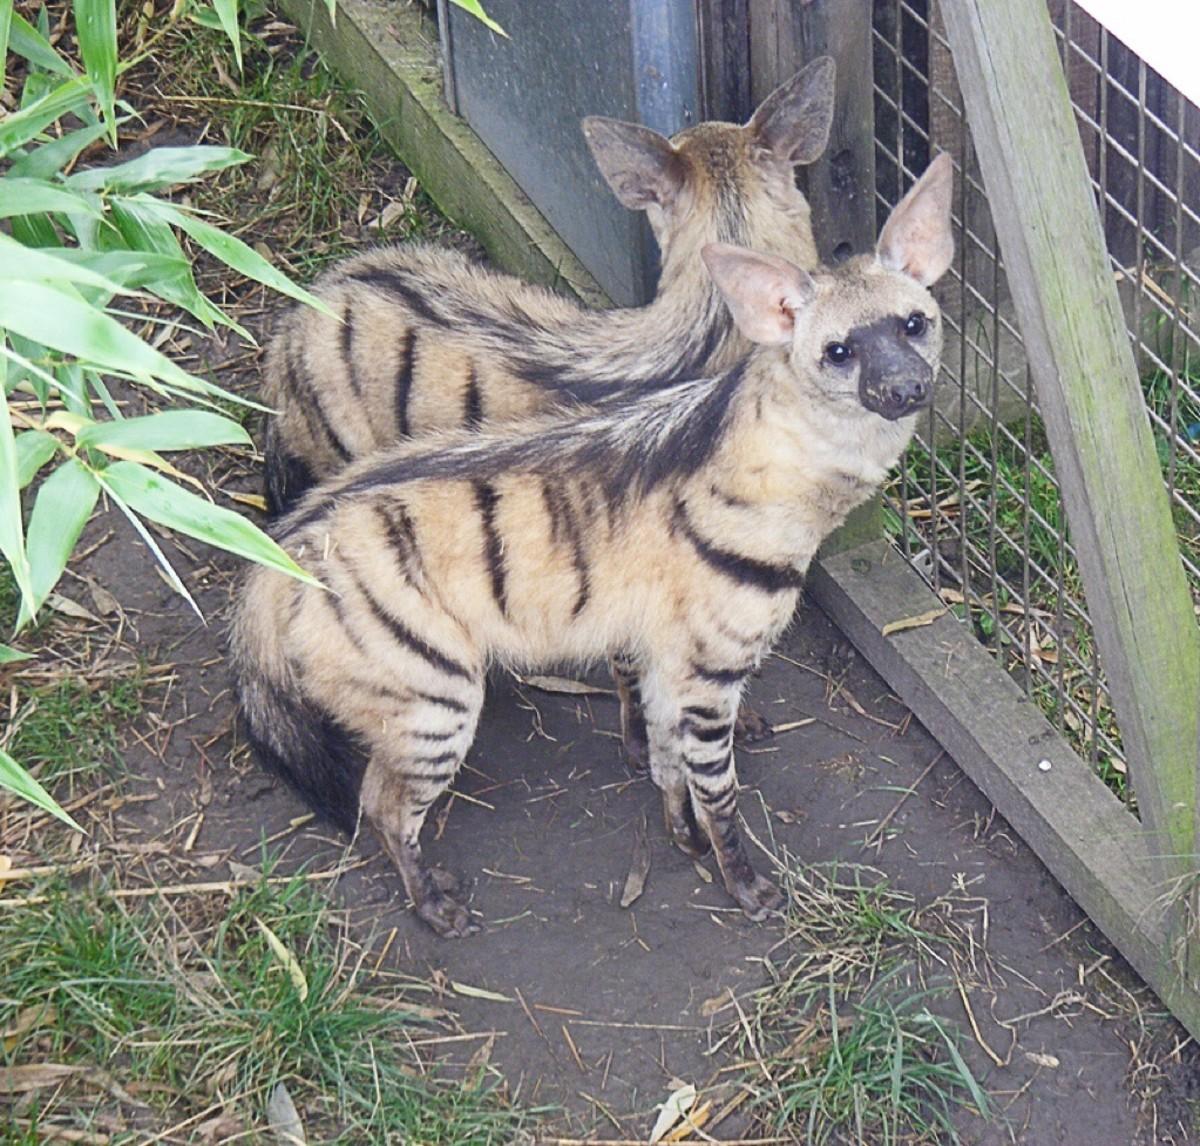 Aardwolf Facts: A Unique Hyena Relative That Eats Termites